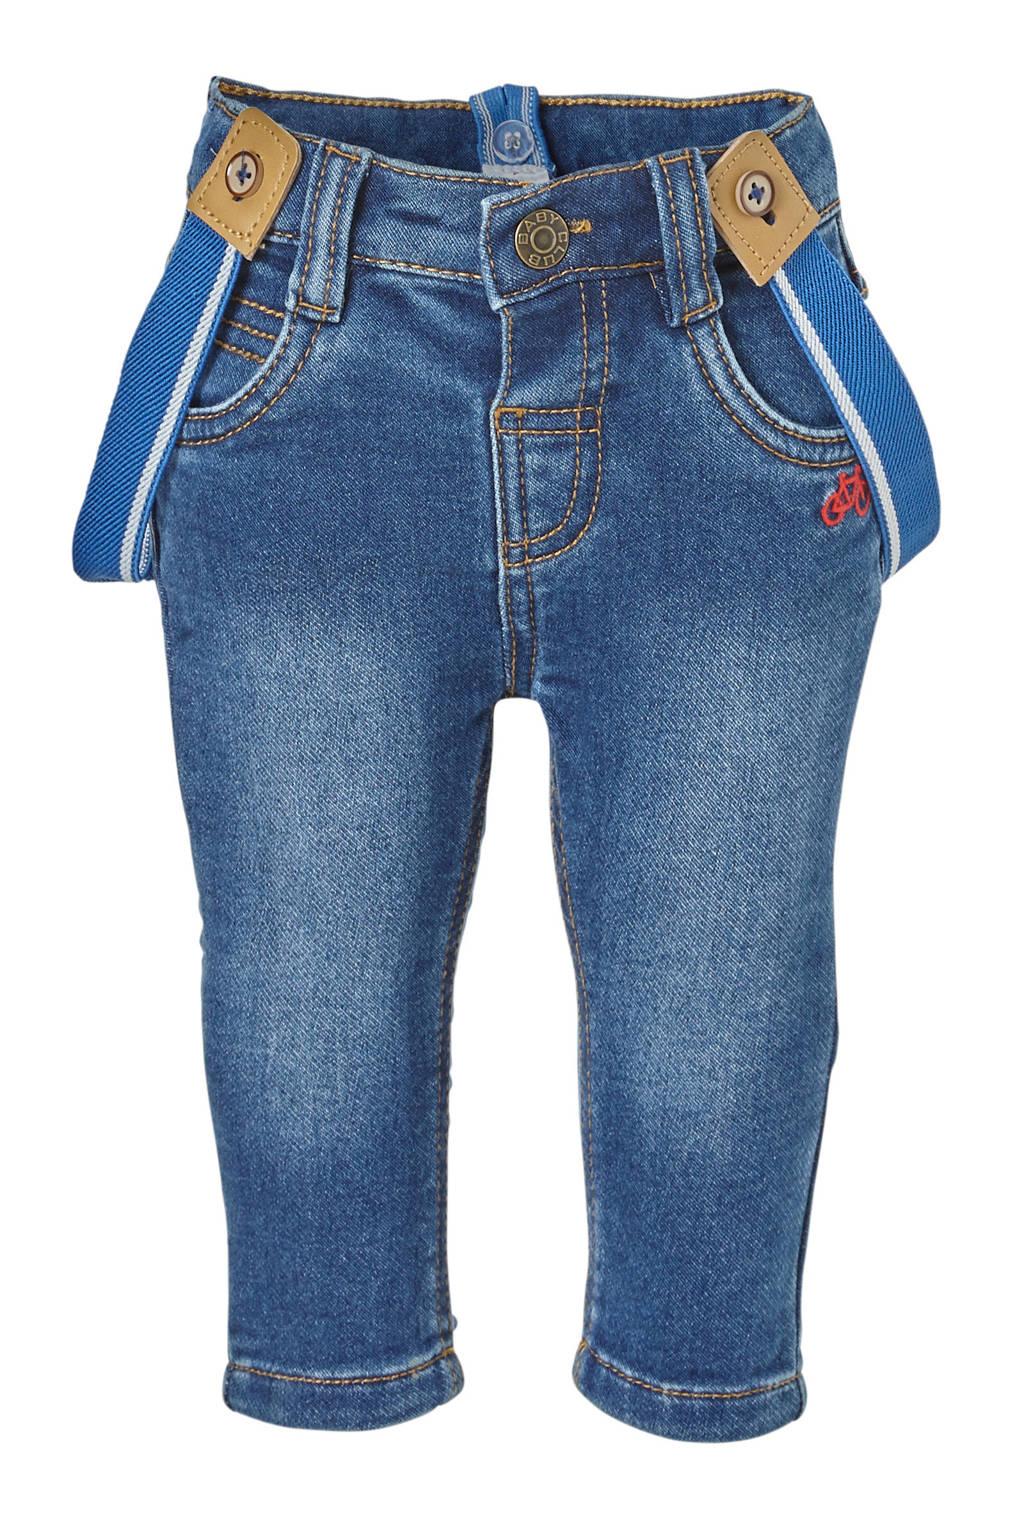 C&A Baby Club jeans donkerblauw, Lichtblauw